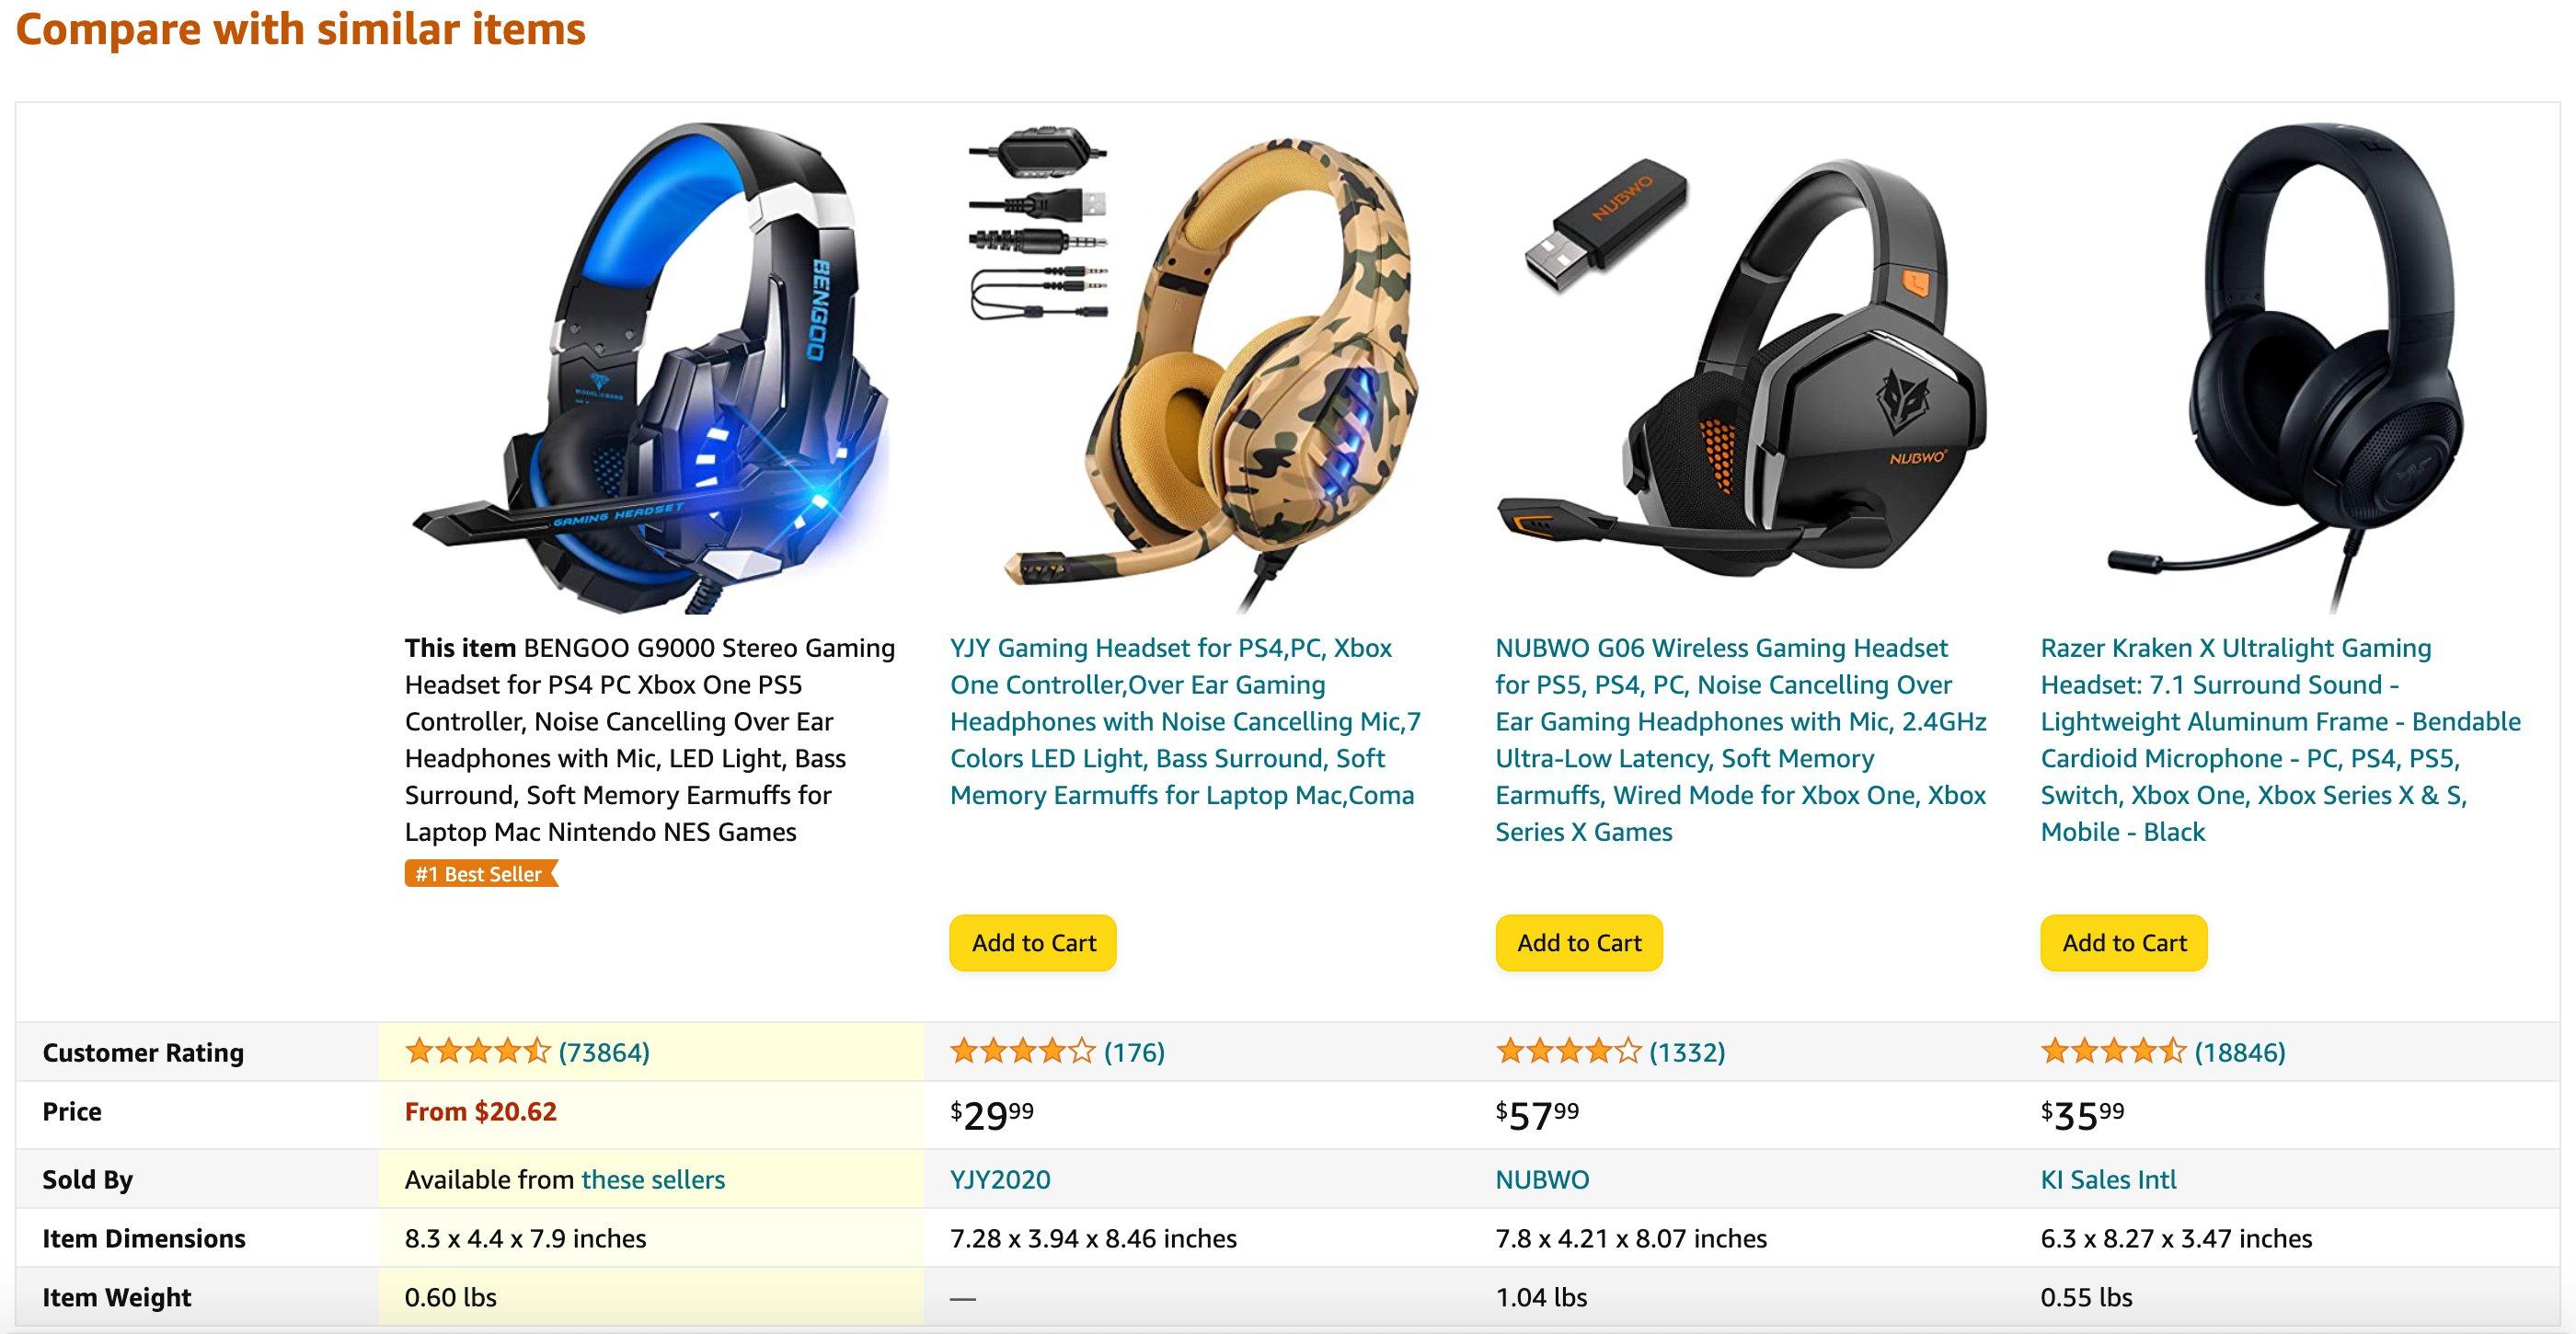 Amazon Compare Item Review